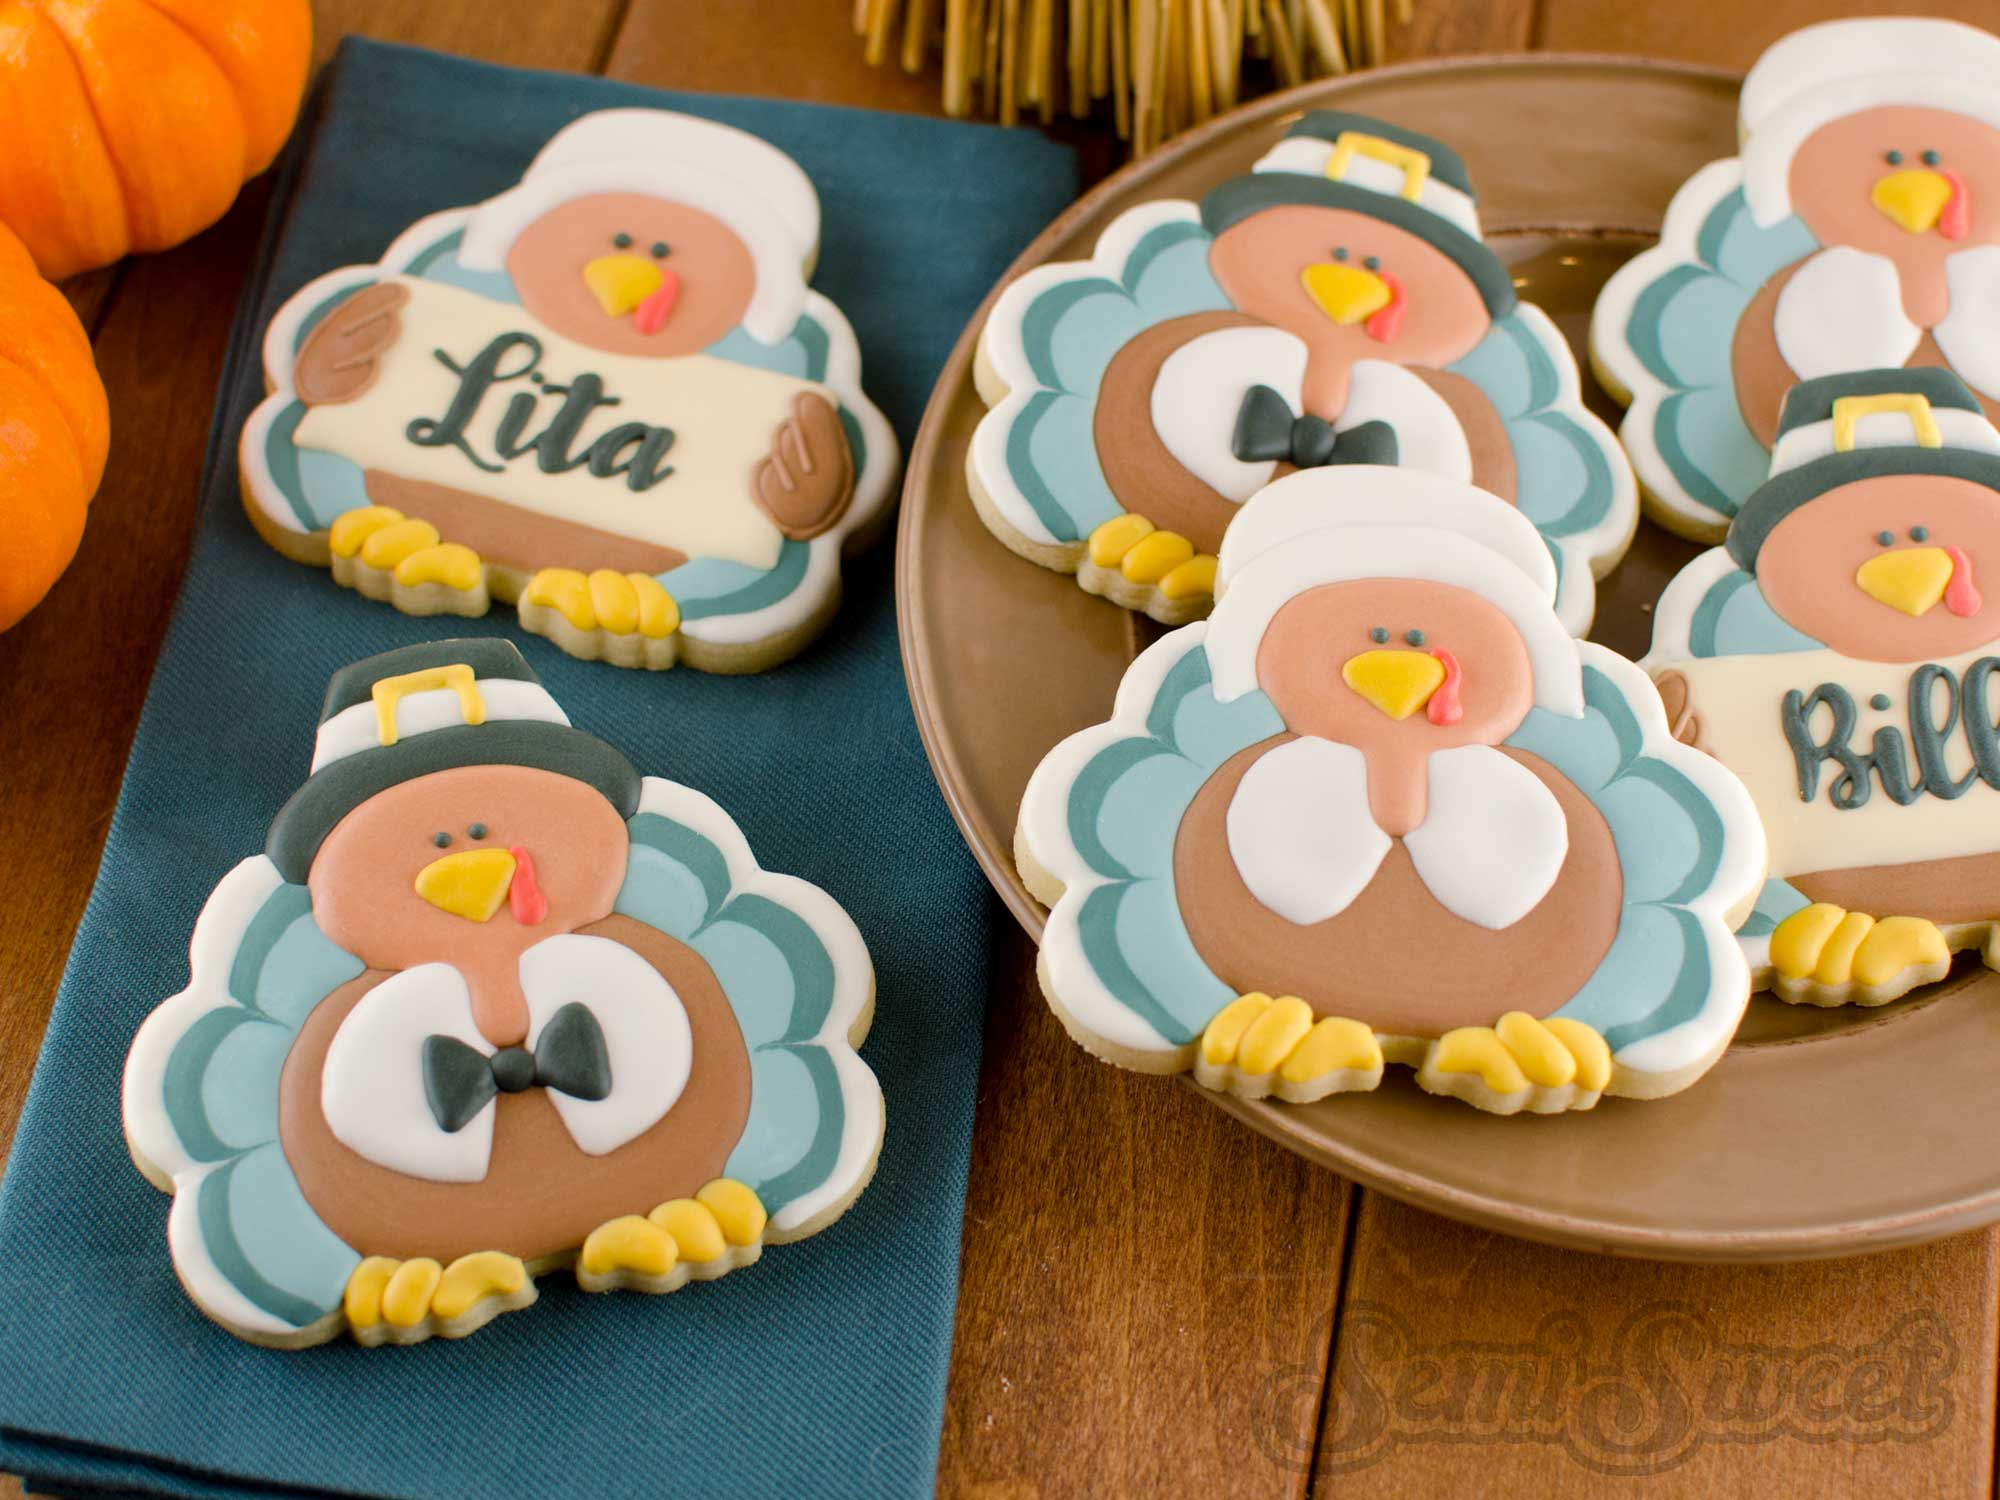 How to Make Pilgrim Turkey Cookies